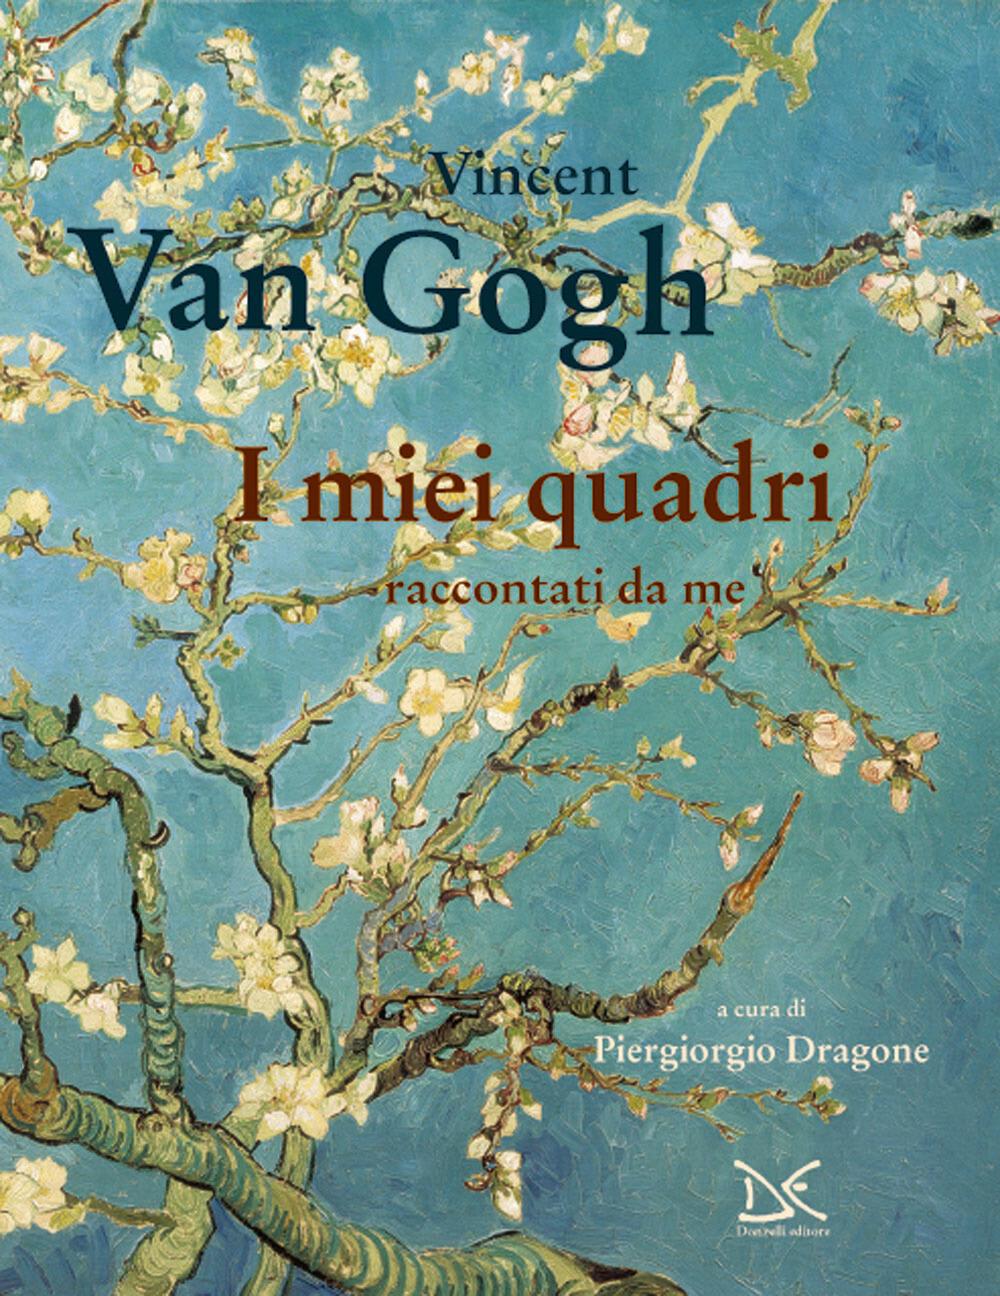 I miei quadri raccontati da me vincent van gogh libro for Ciao bambini van gogh